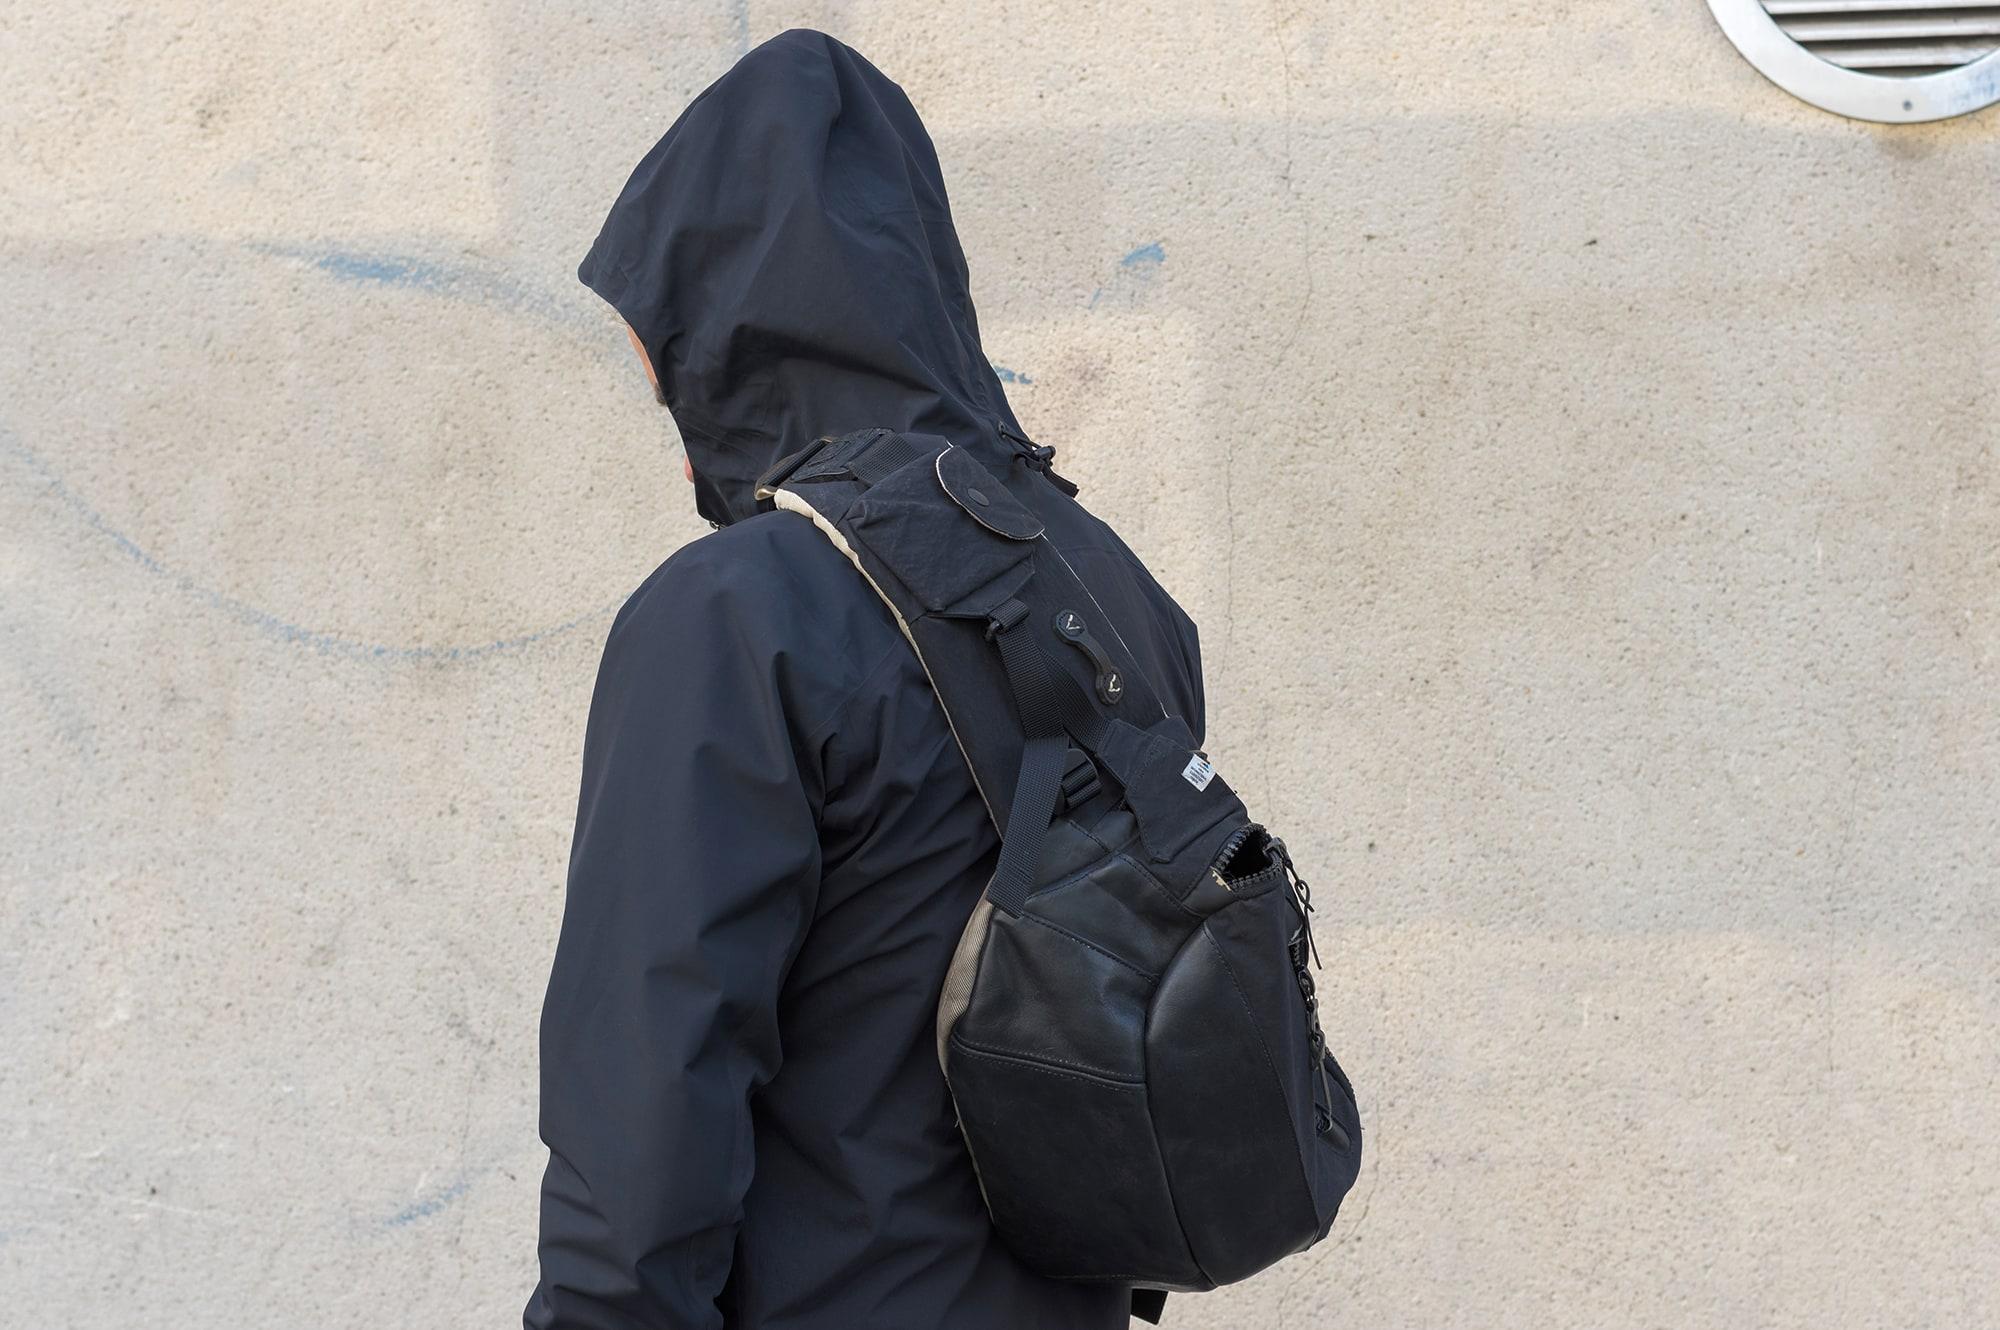 tenue stule street heritage techwear avec la composite jacket de arc'teryx veilance en goretex et le bomber technique polartec bonne gueule + visvim ballistic cordura lumberjack backpack